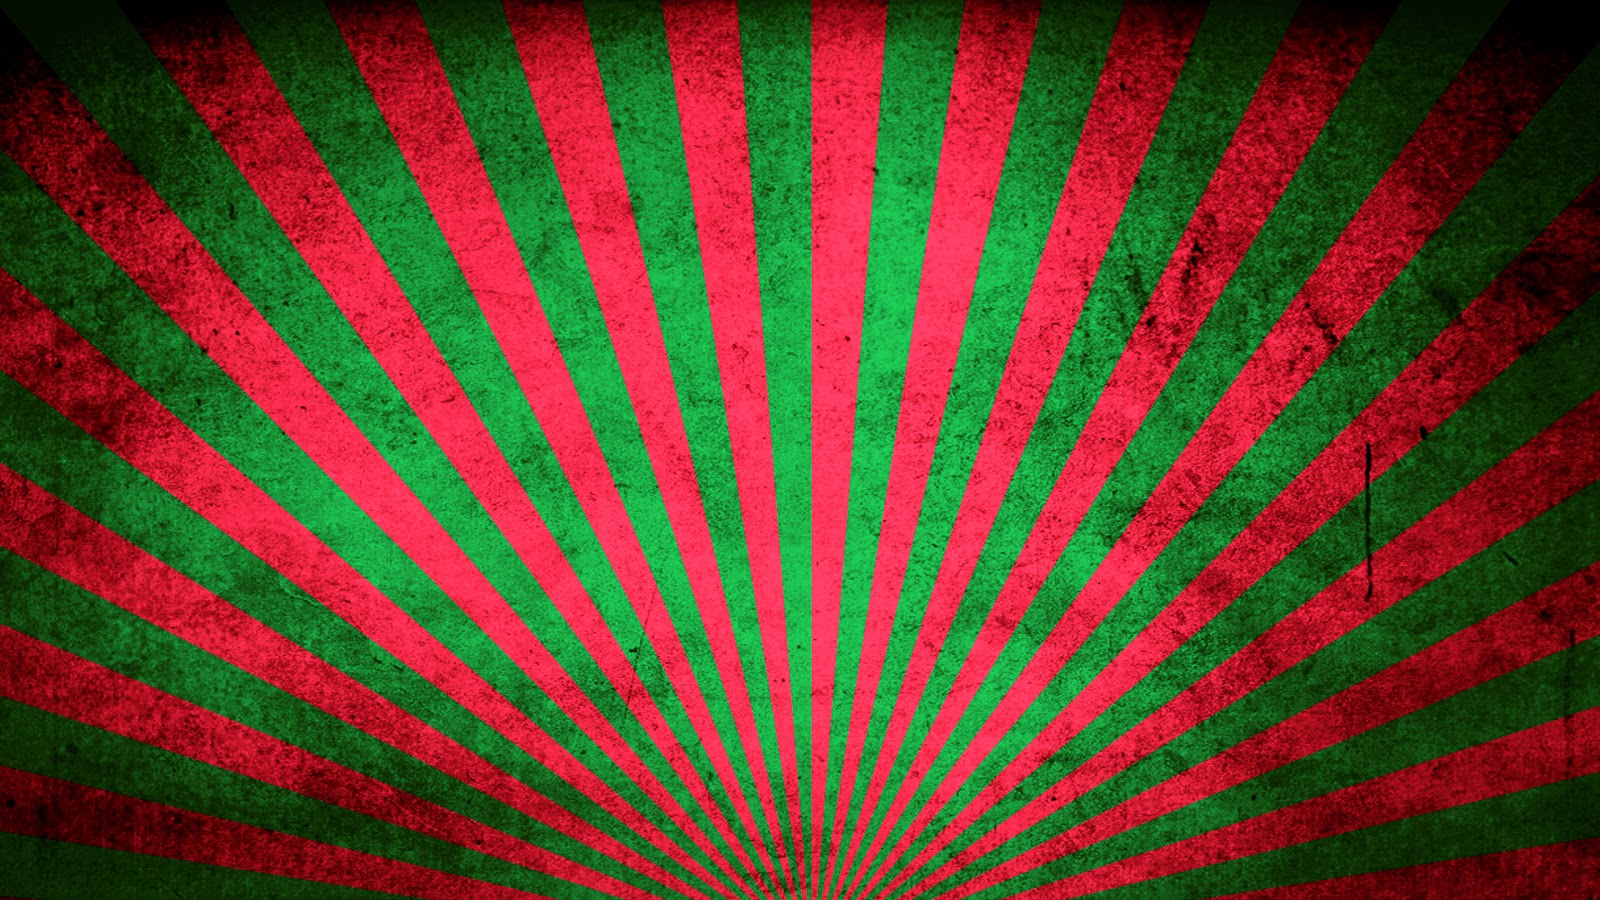 Pink Floyd Wallpaper Iphone 4 Fondos Para Whatsapp Patada De Caballo Retro Wallpaper